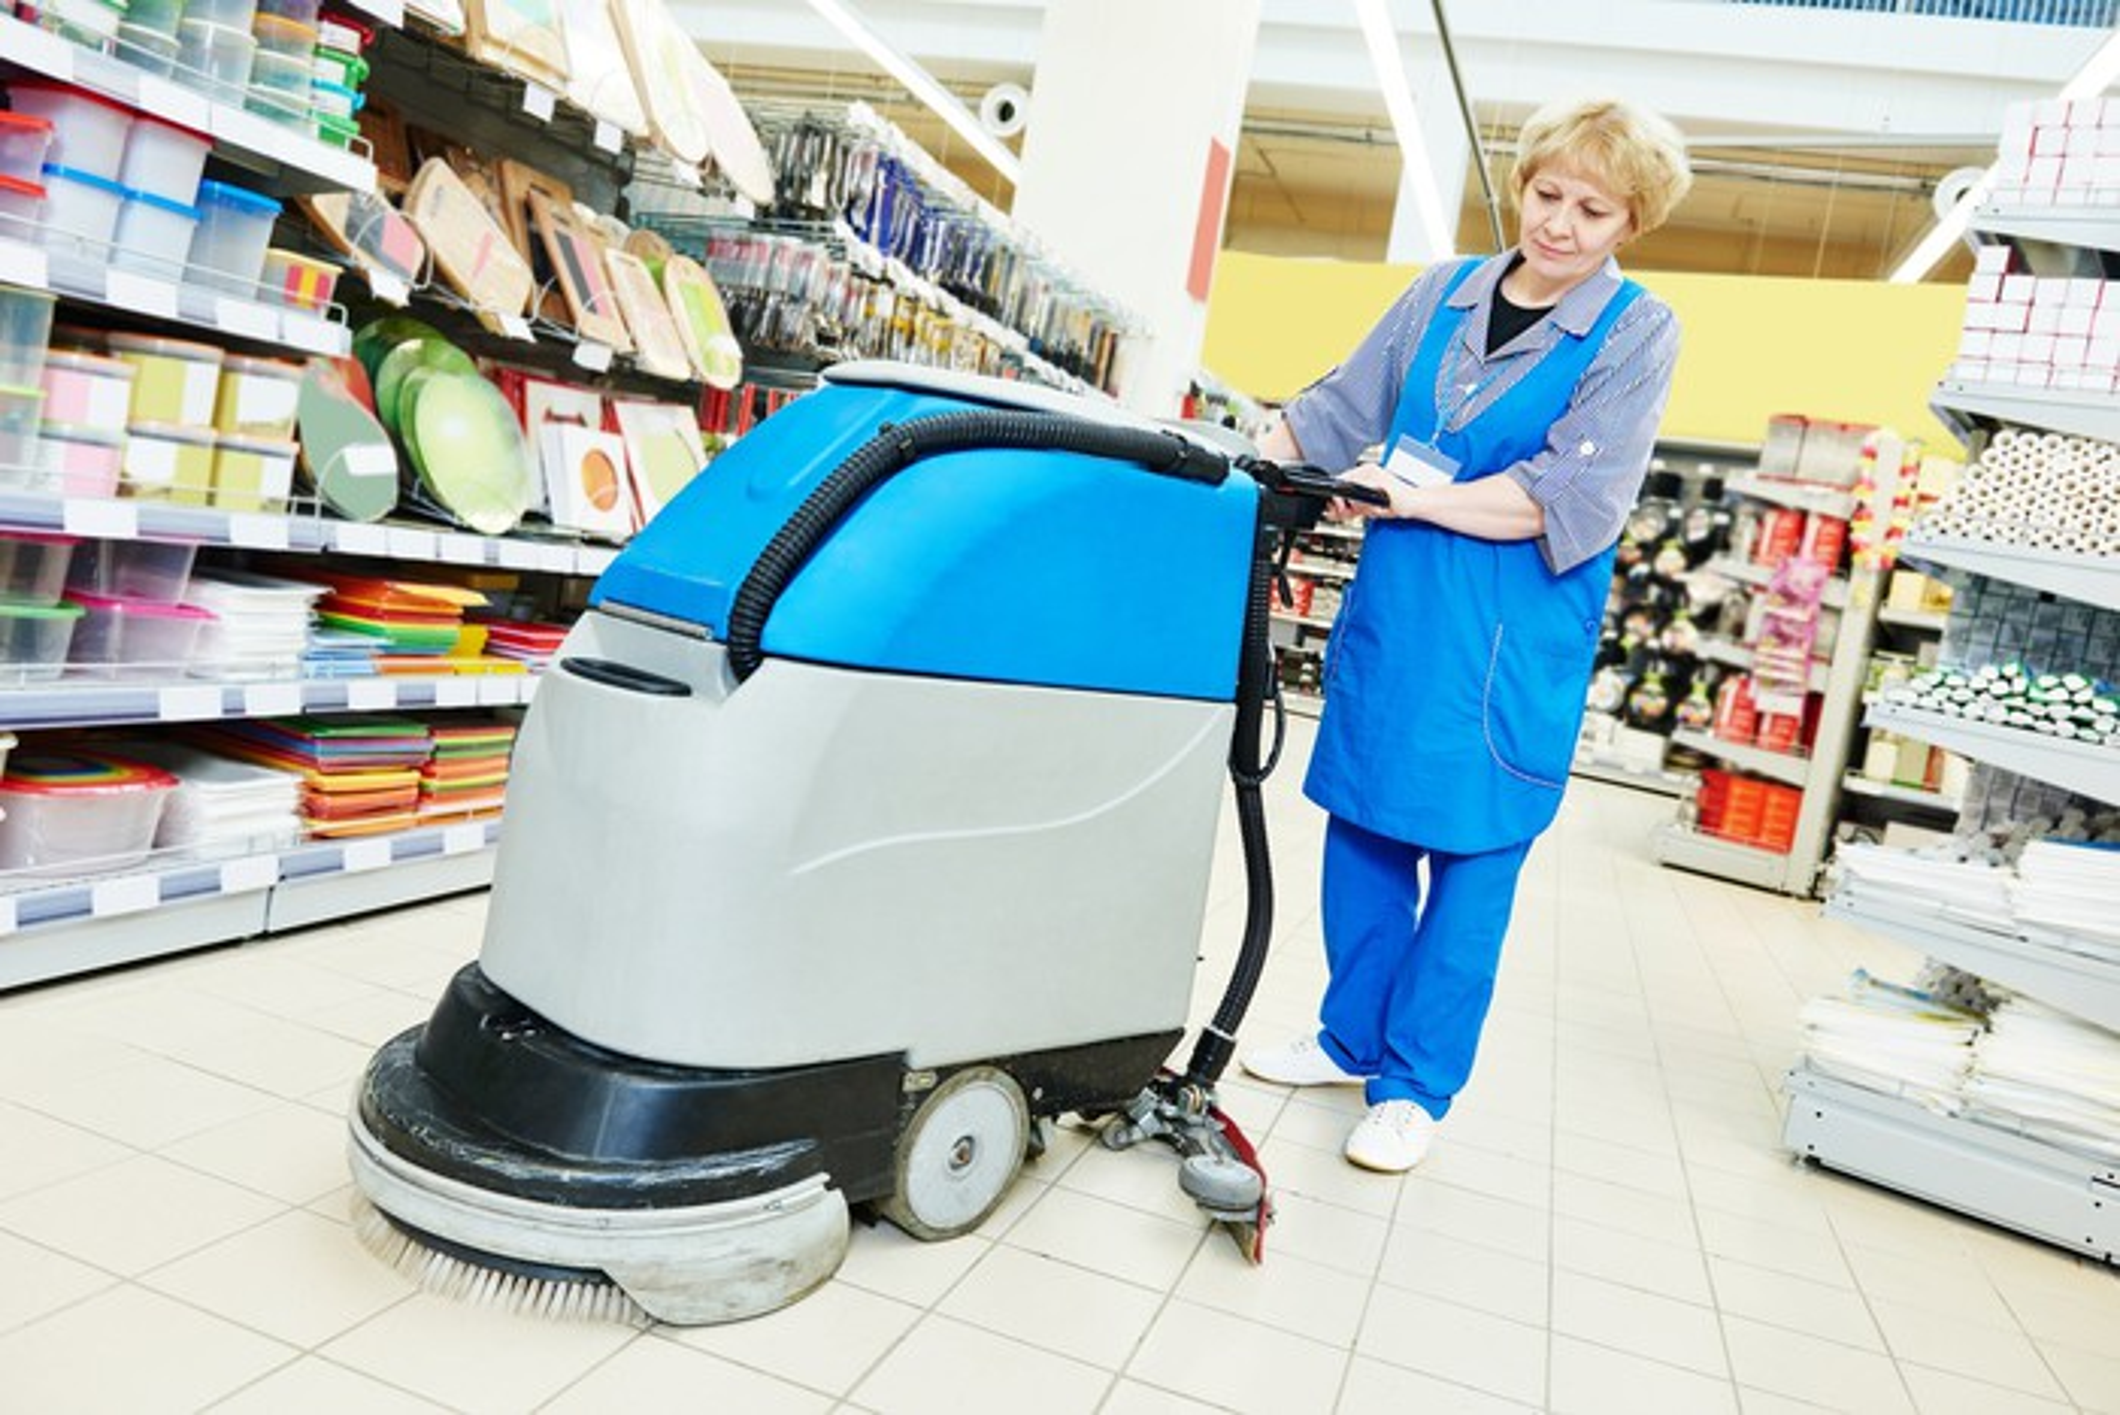 An employee operates a floor scrubber.